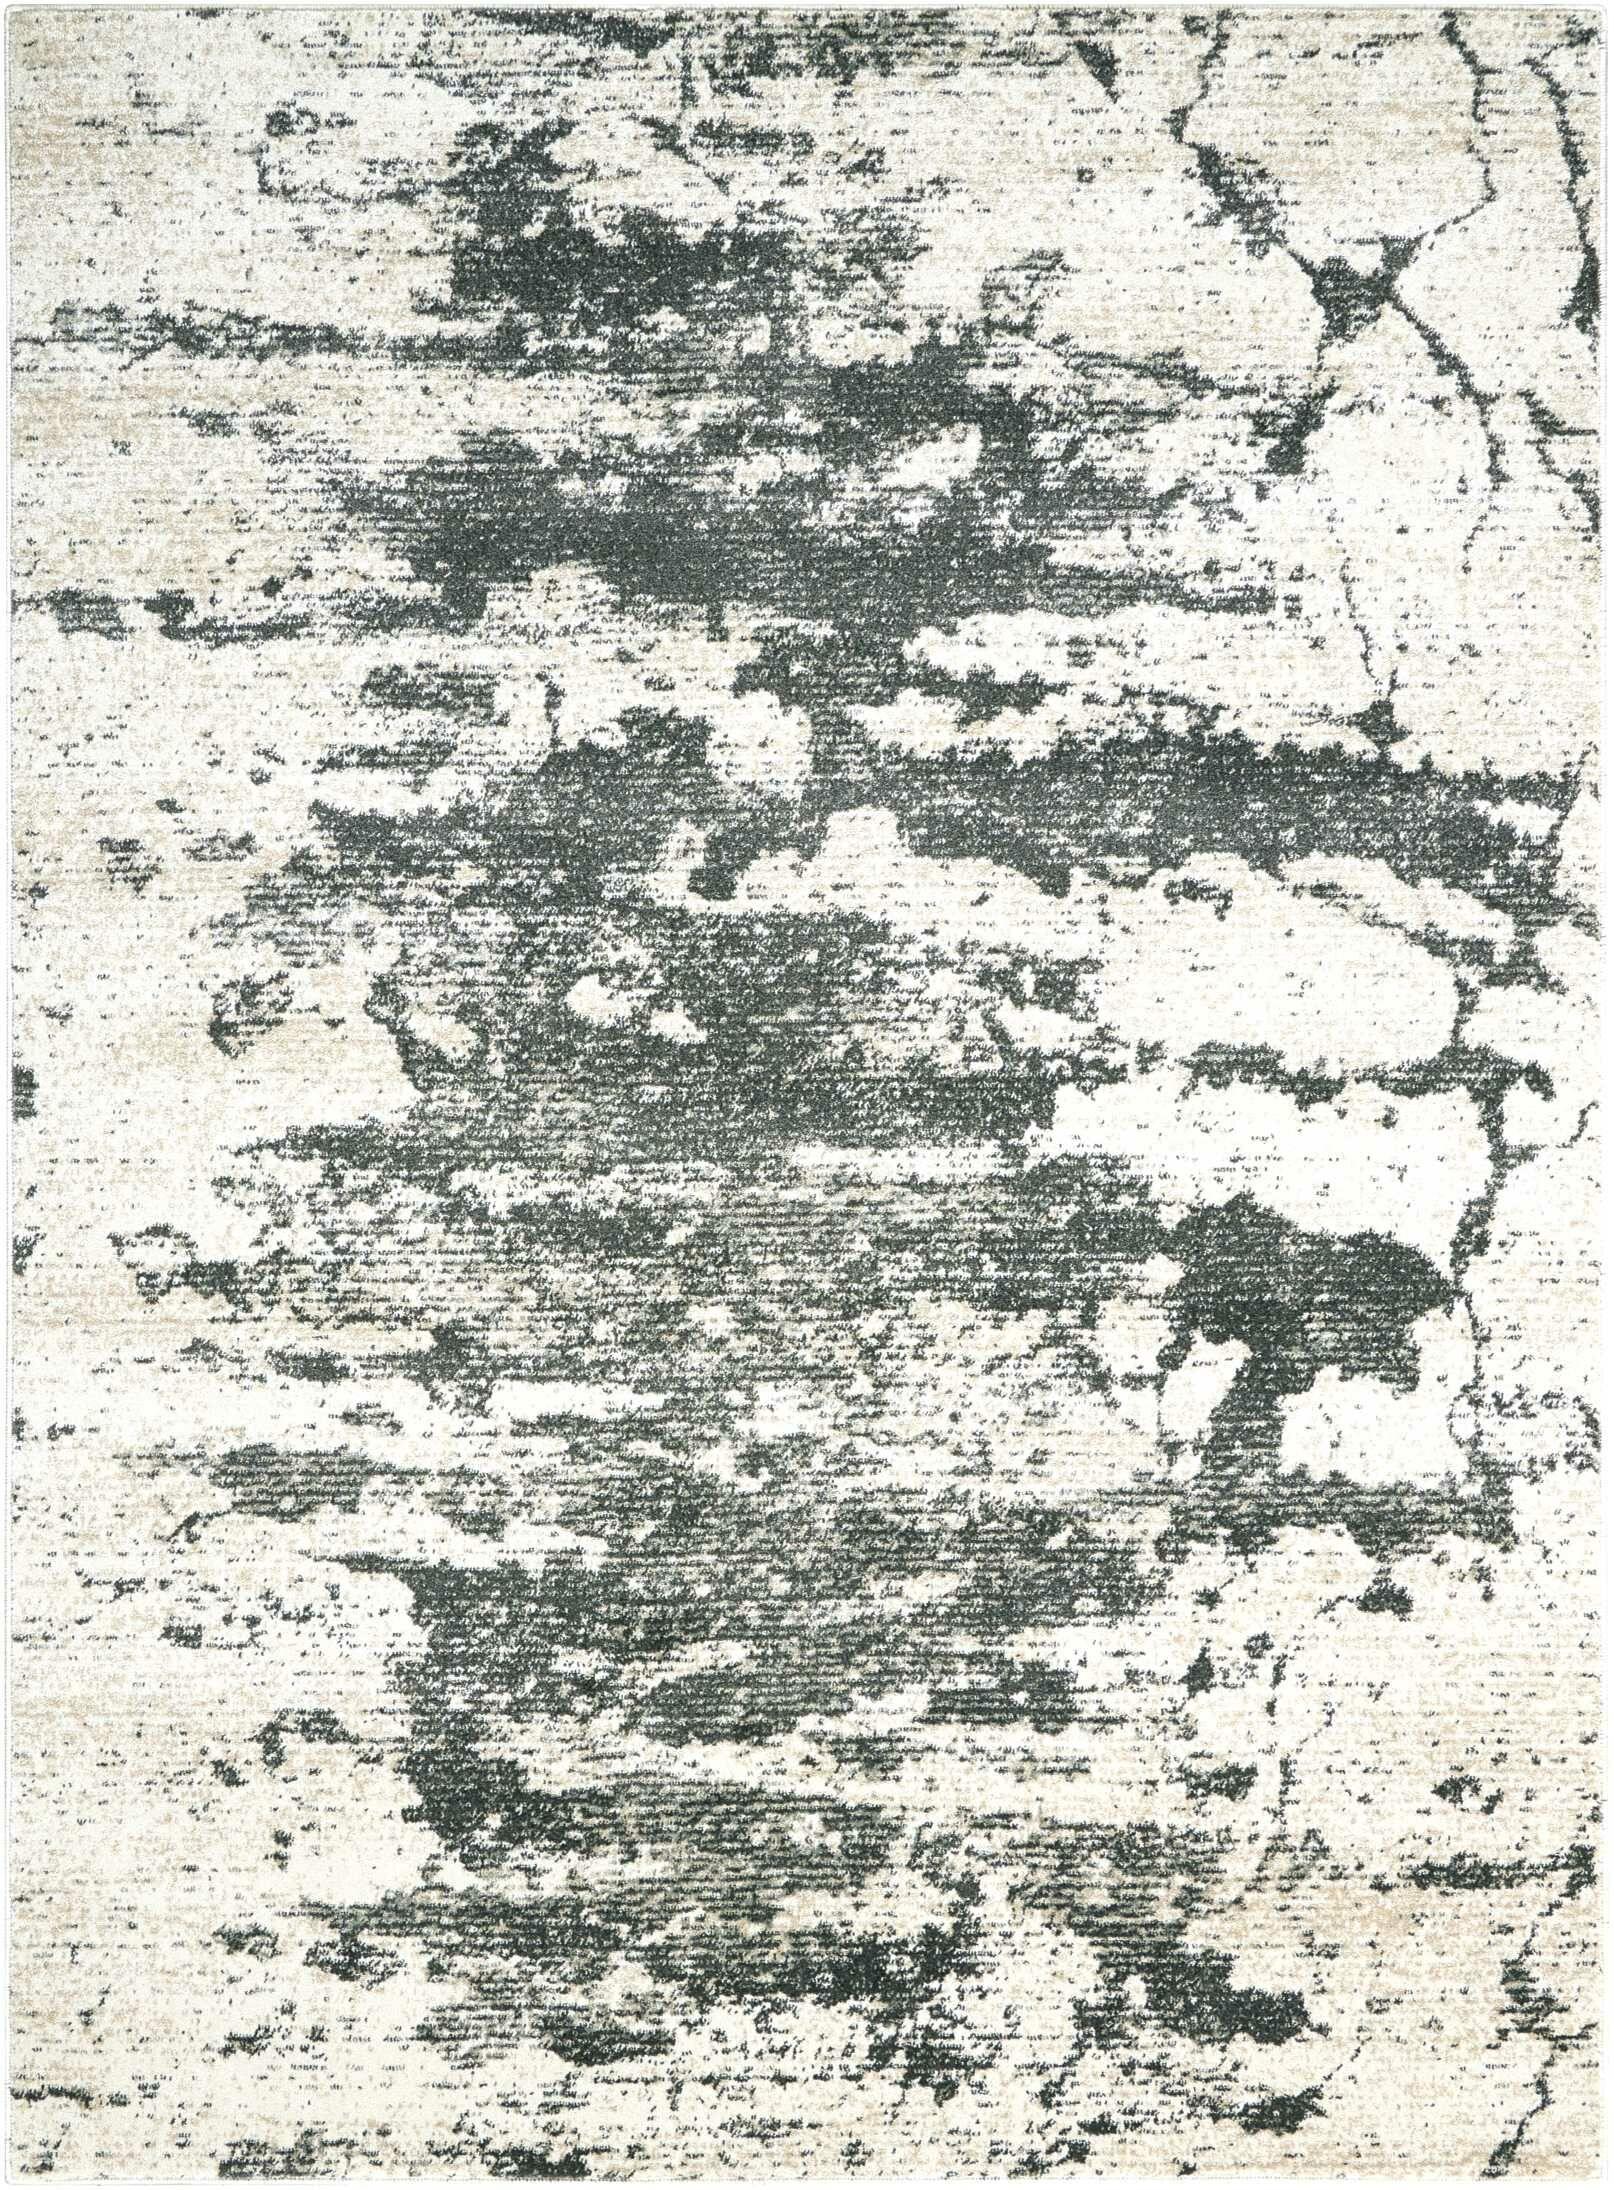 Mana Ivory Gray Area Rug Rug Size: Rectangle 3'10